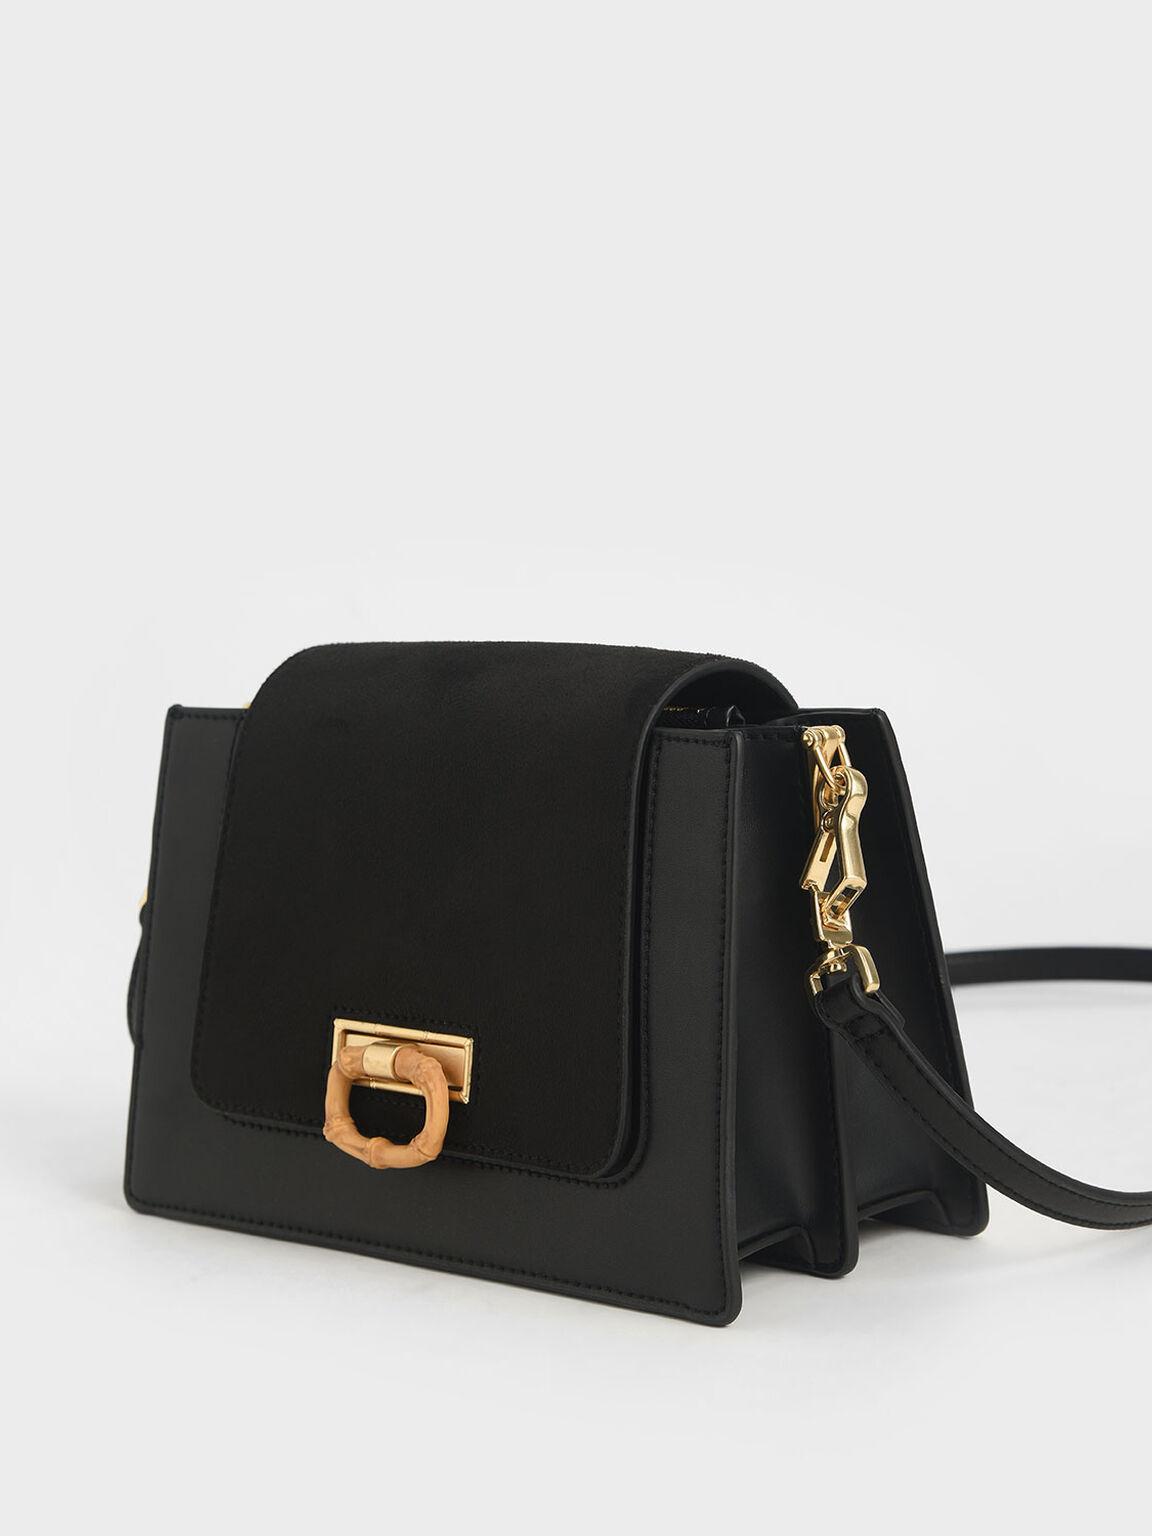 竹紋拉環斜背包, 黑色, hi-res